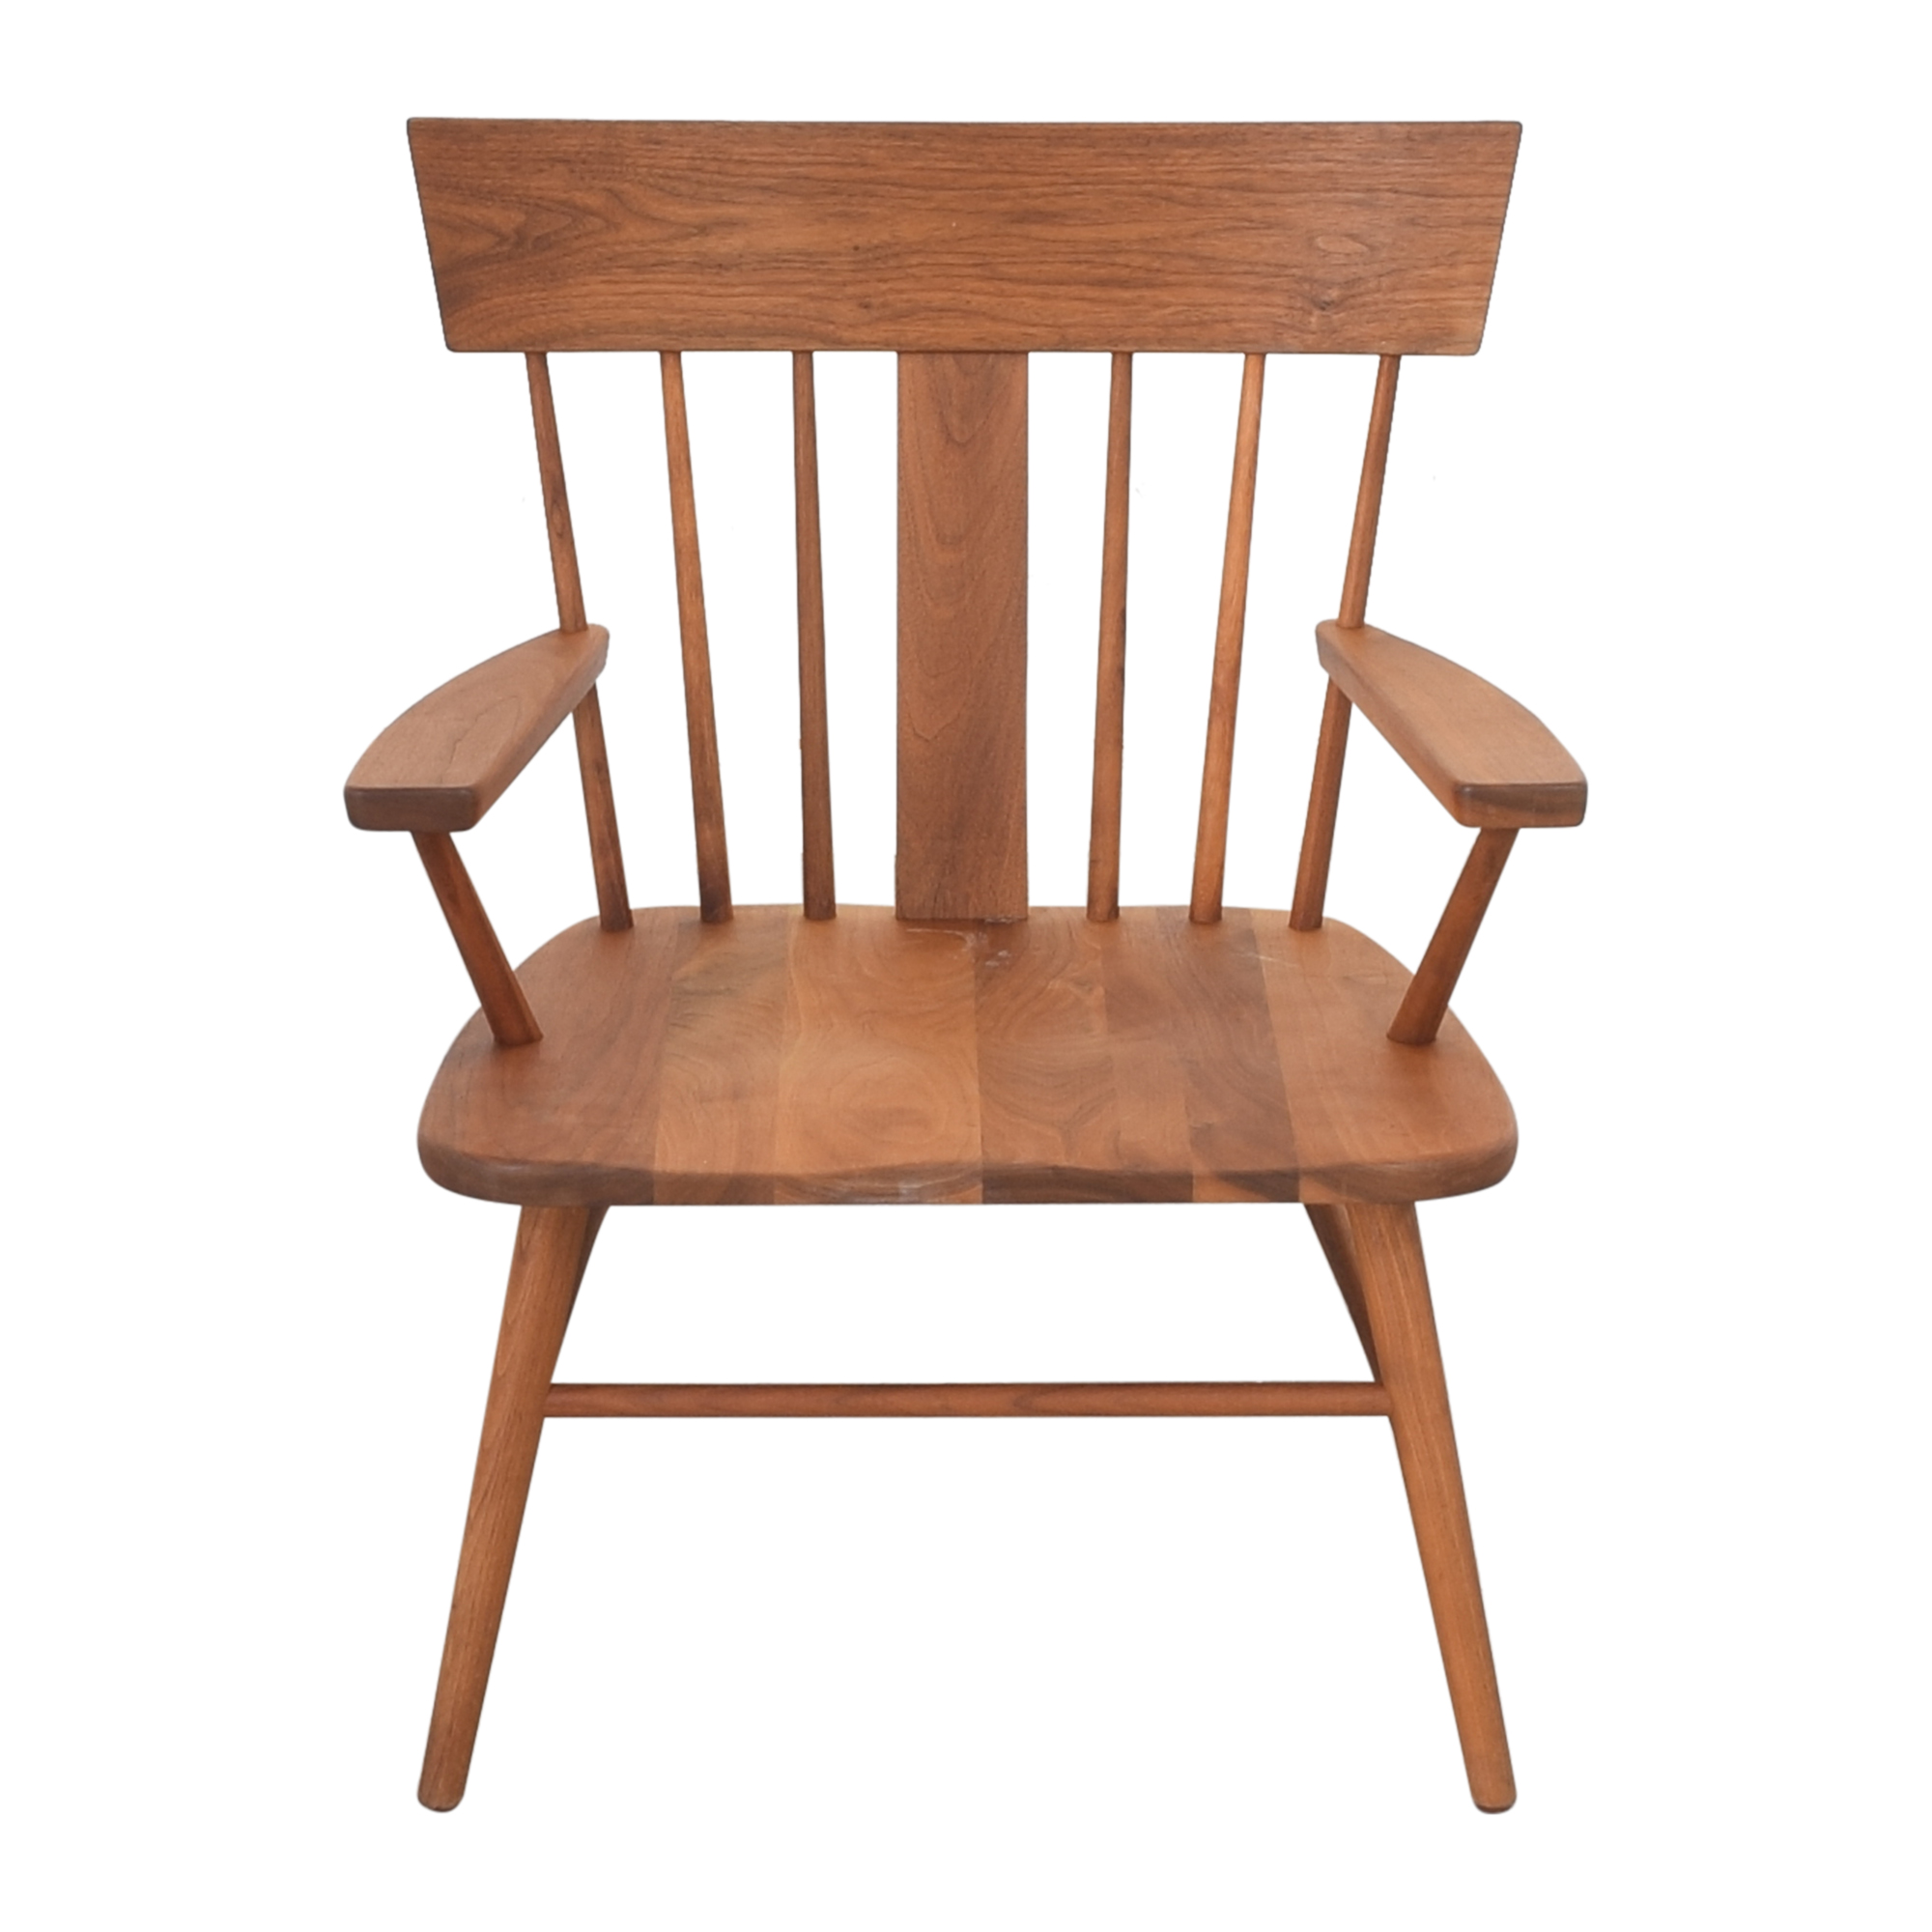 Room & Board Room & Board Sandberg Chair brown